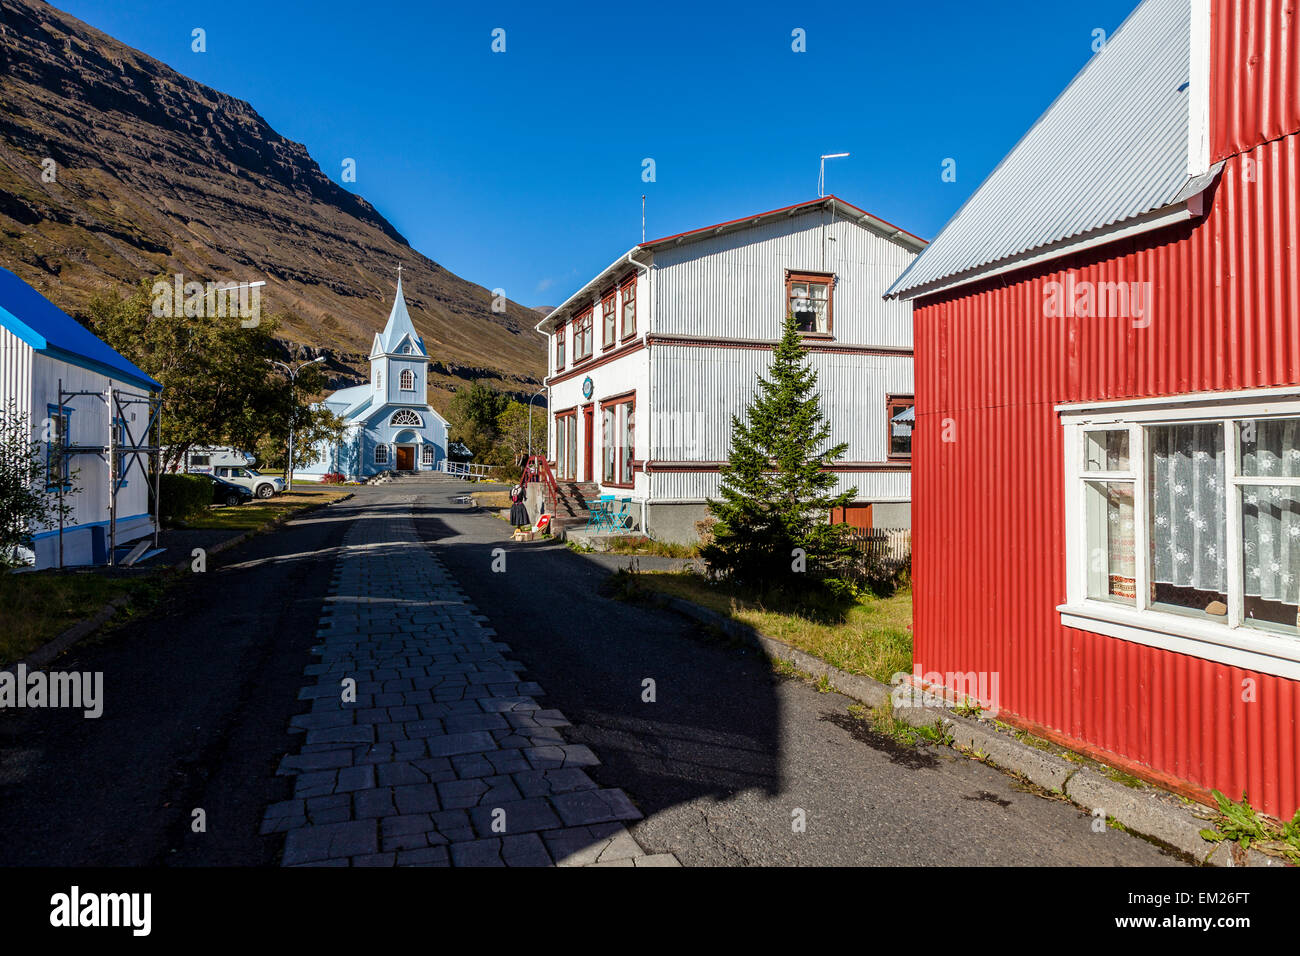 Street in Seydisfjordur, Iceland - Stock Image